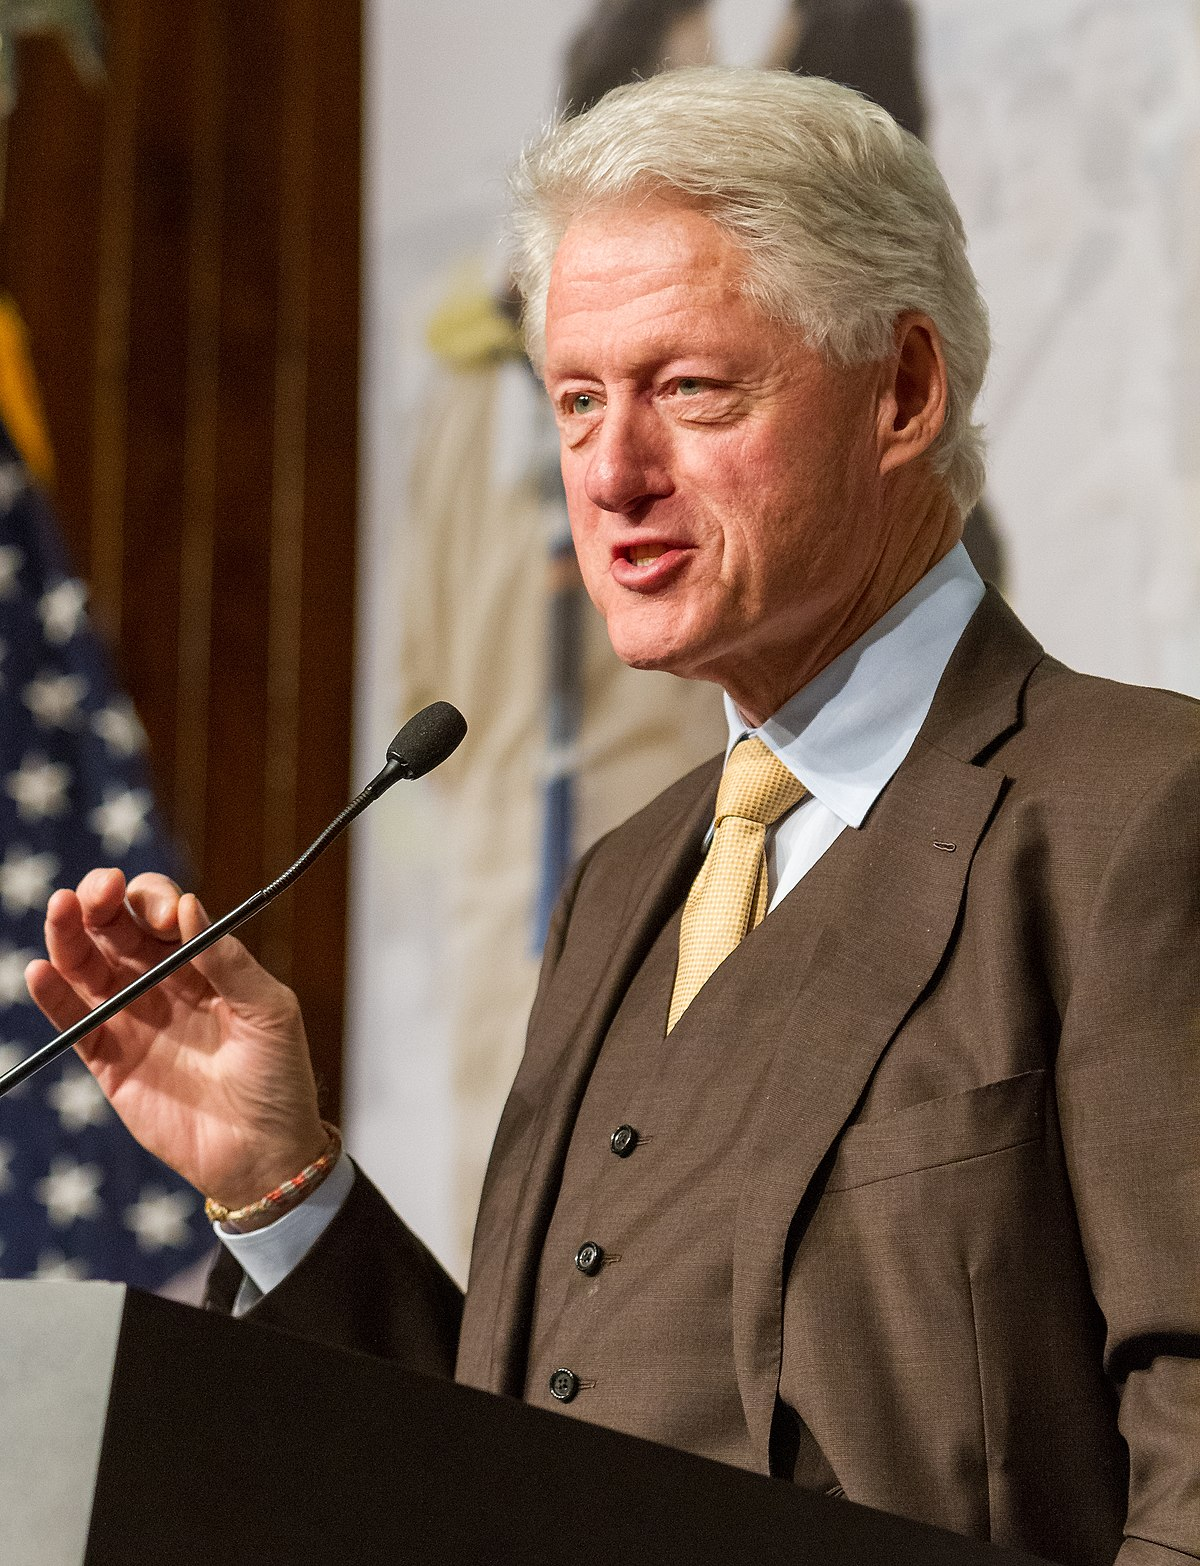 Bill Clinton Wikipedia - Wikipedia bill clinton